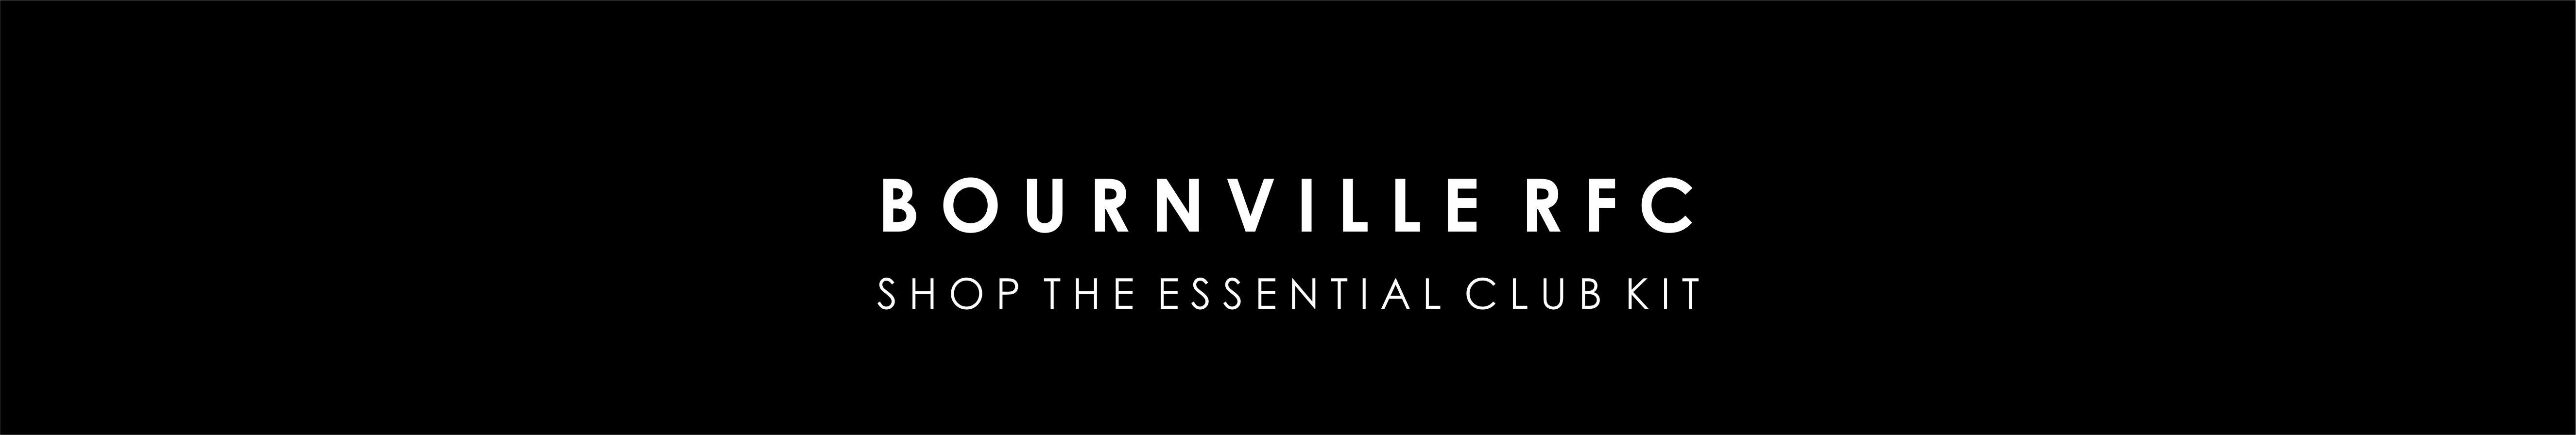 bournville-rfc.jpg